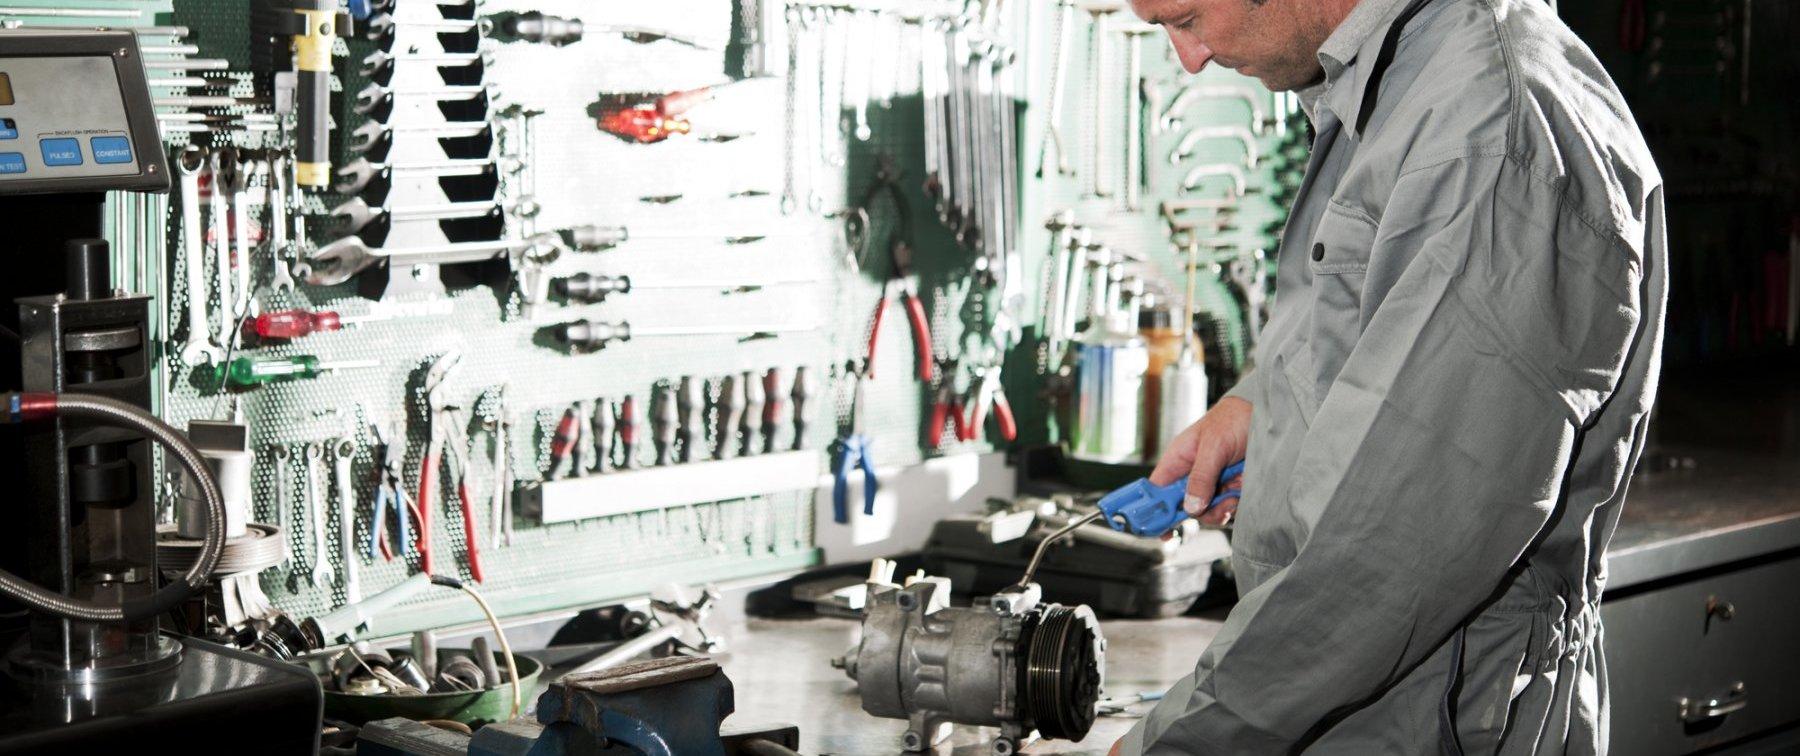 1 Small Engine Repair Service In Klamath Falls Oregon